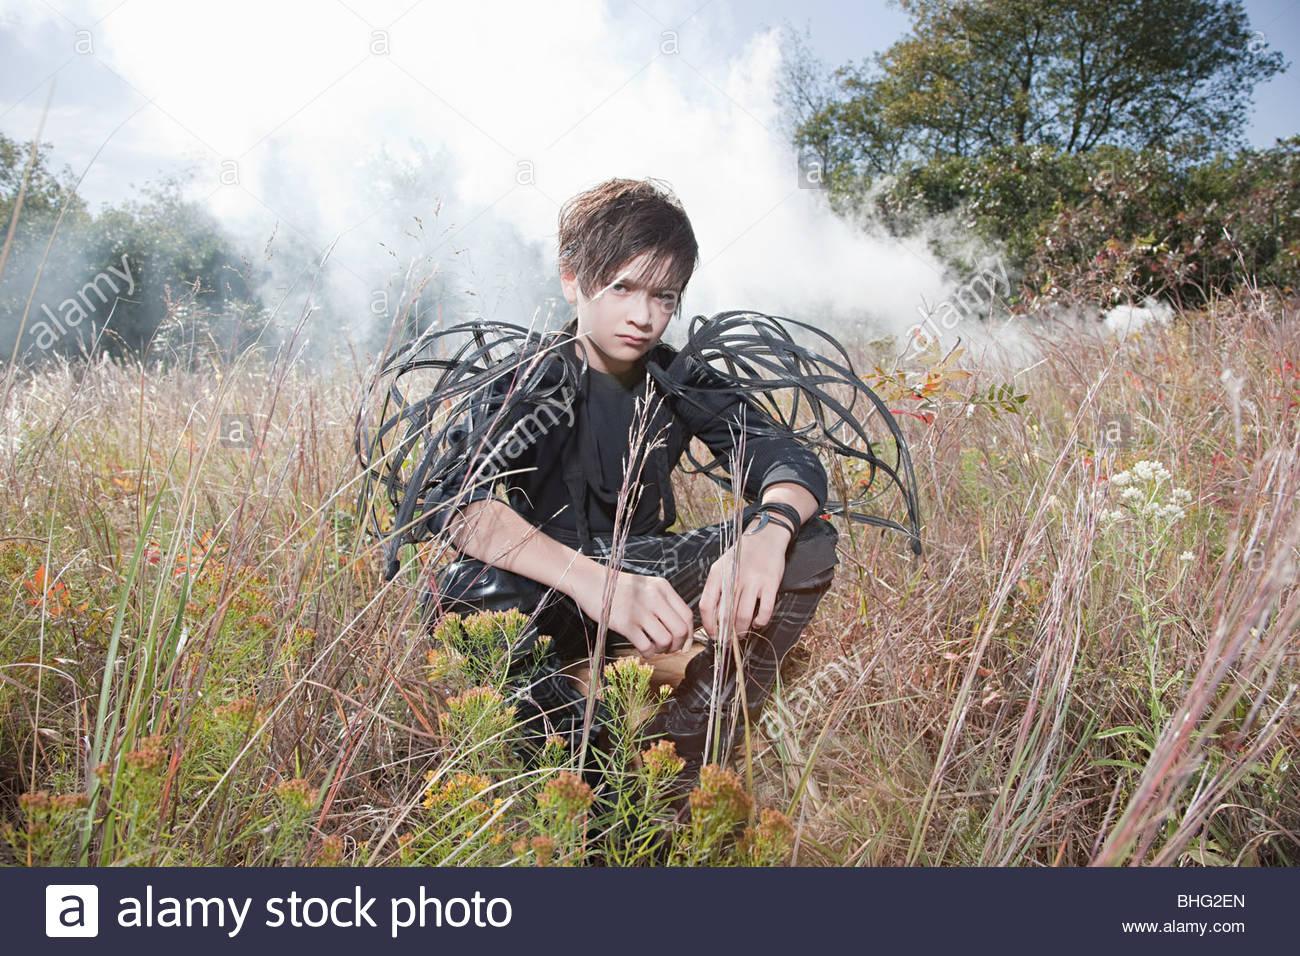 Boy wearing unusual costume - Stock Image